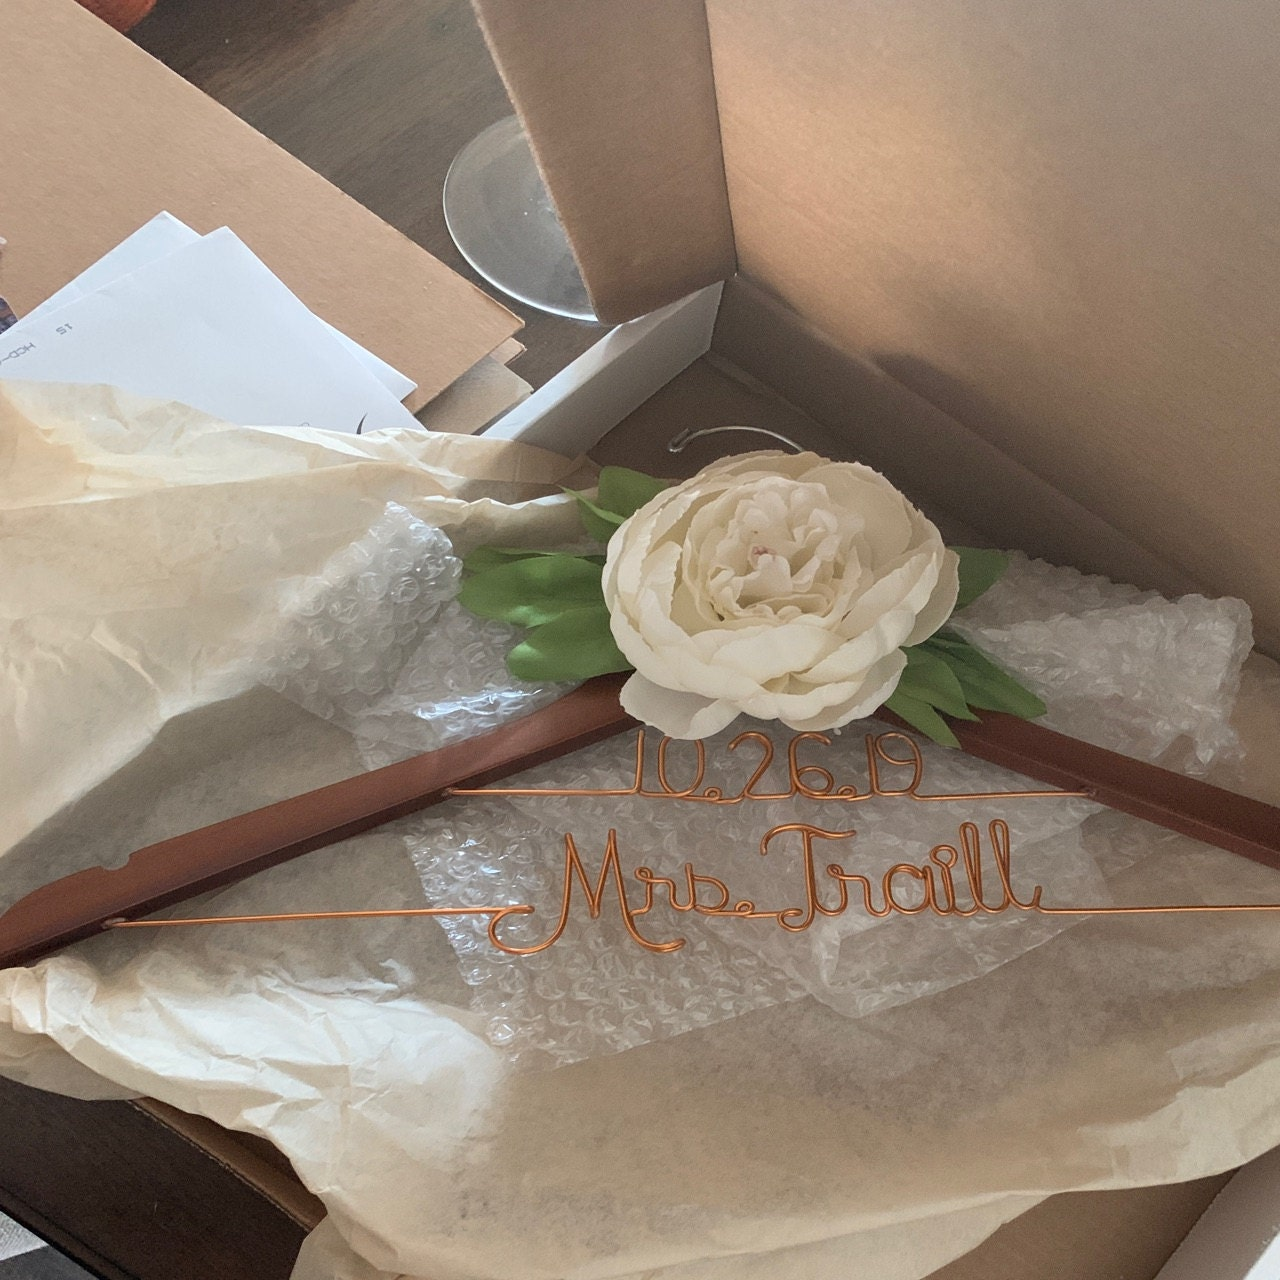 Ava McEachern added a photo of their purchase